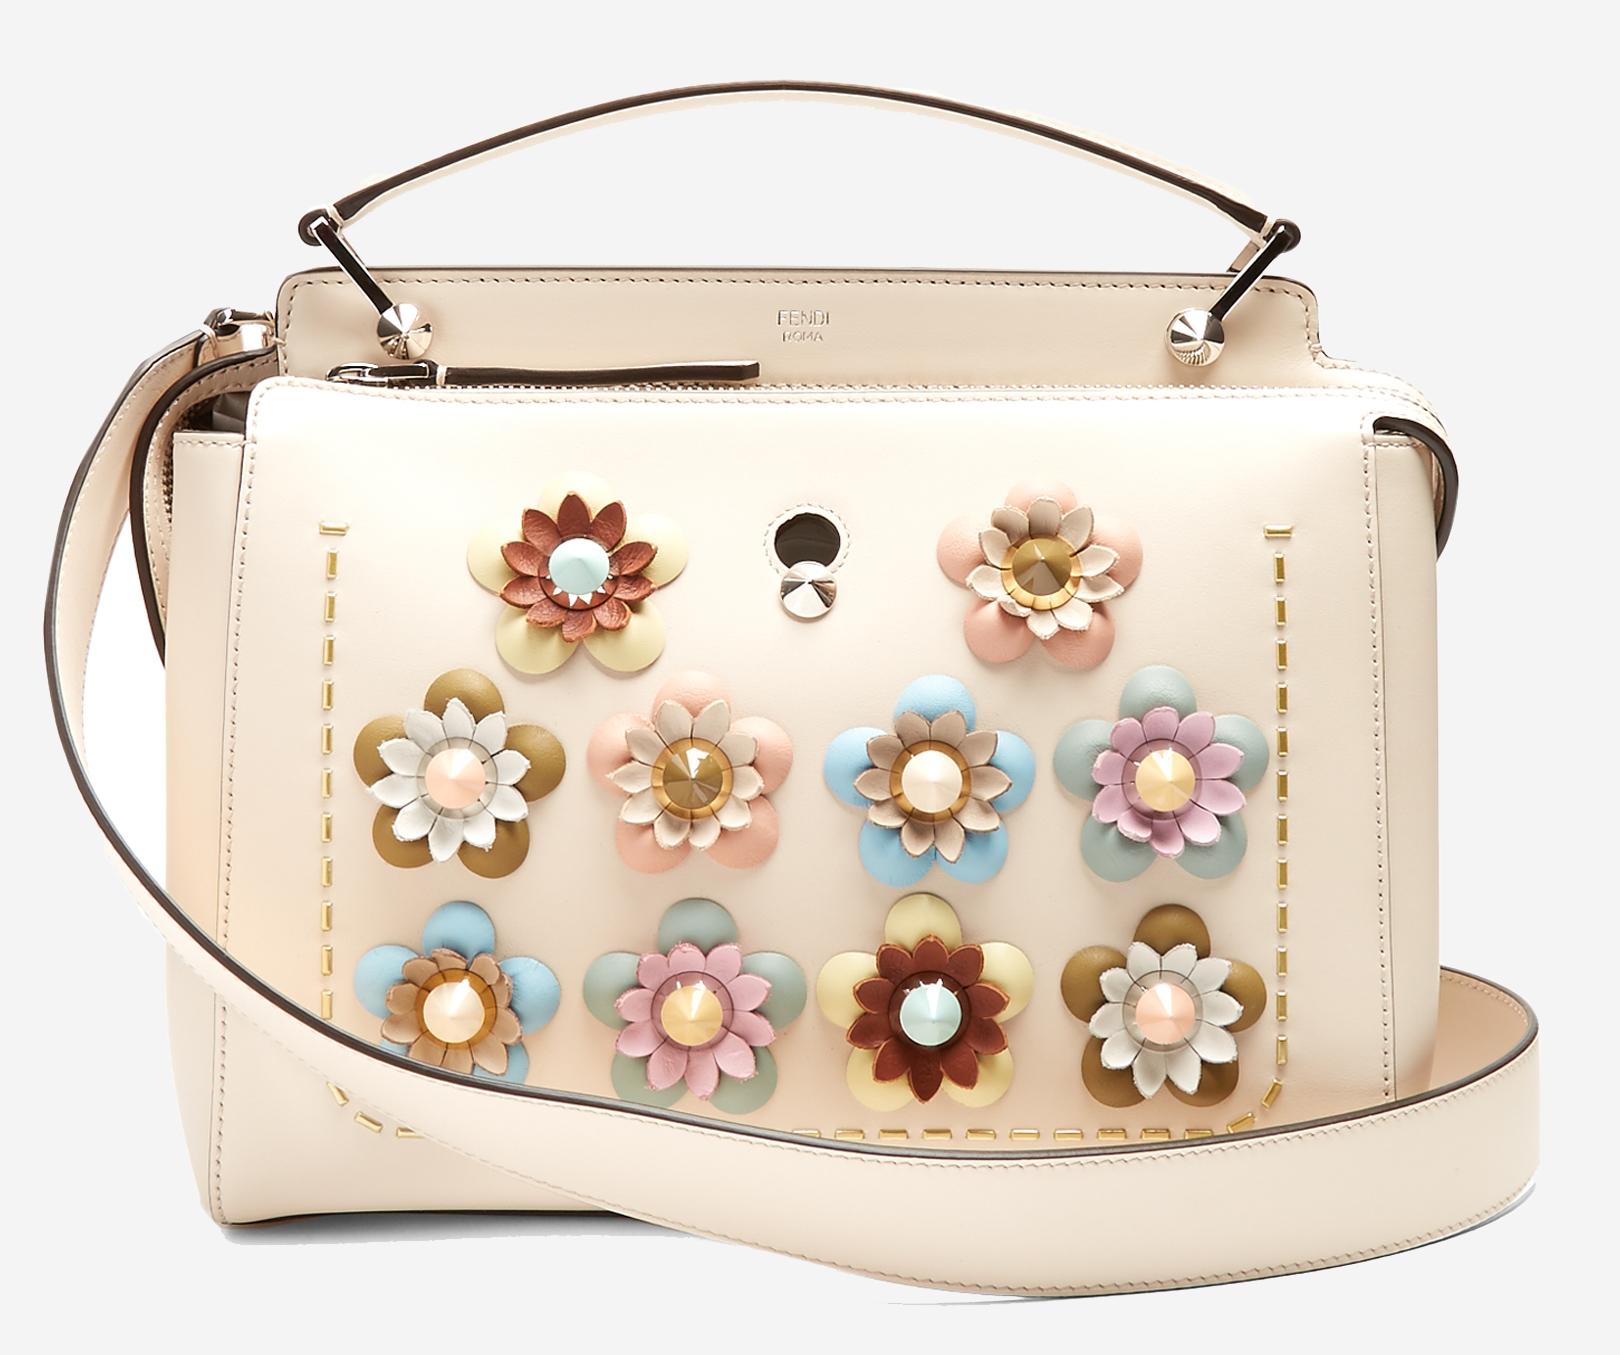 Fendi Dotcom flower-appliqué leather bag